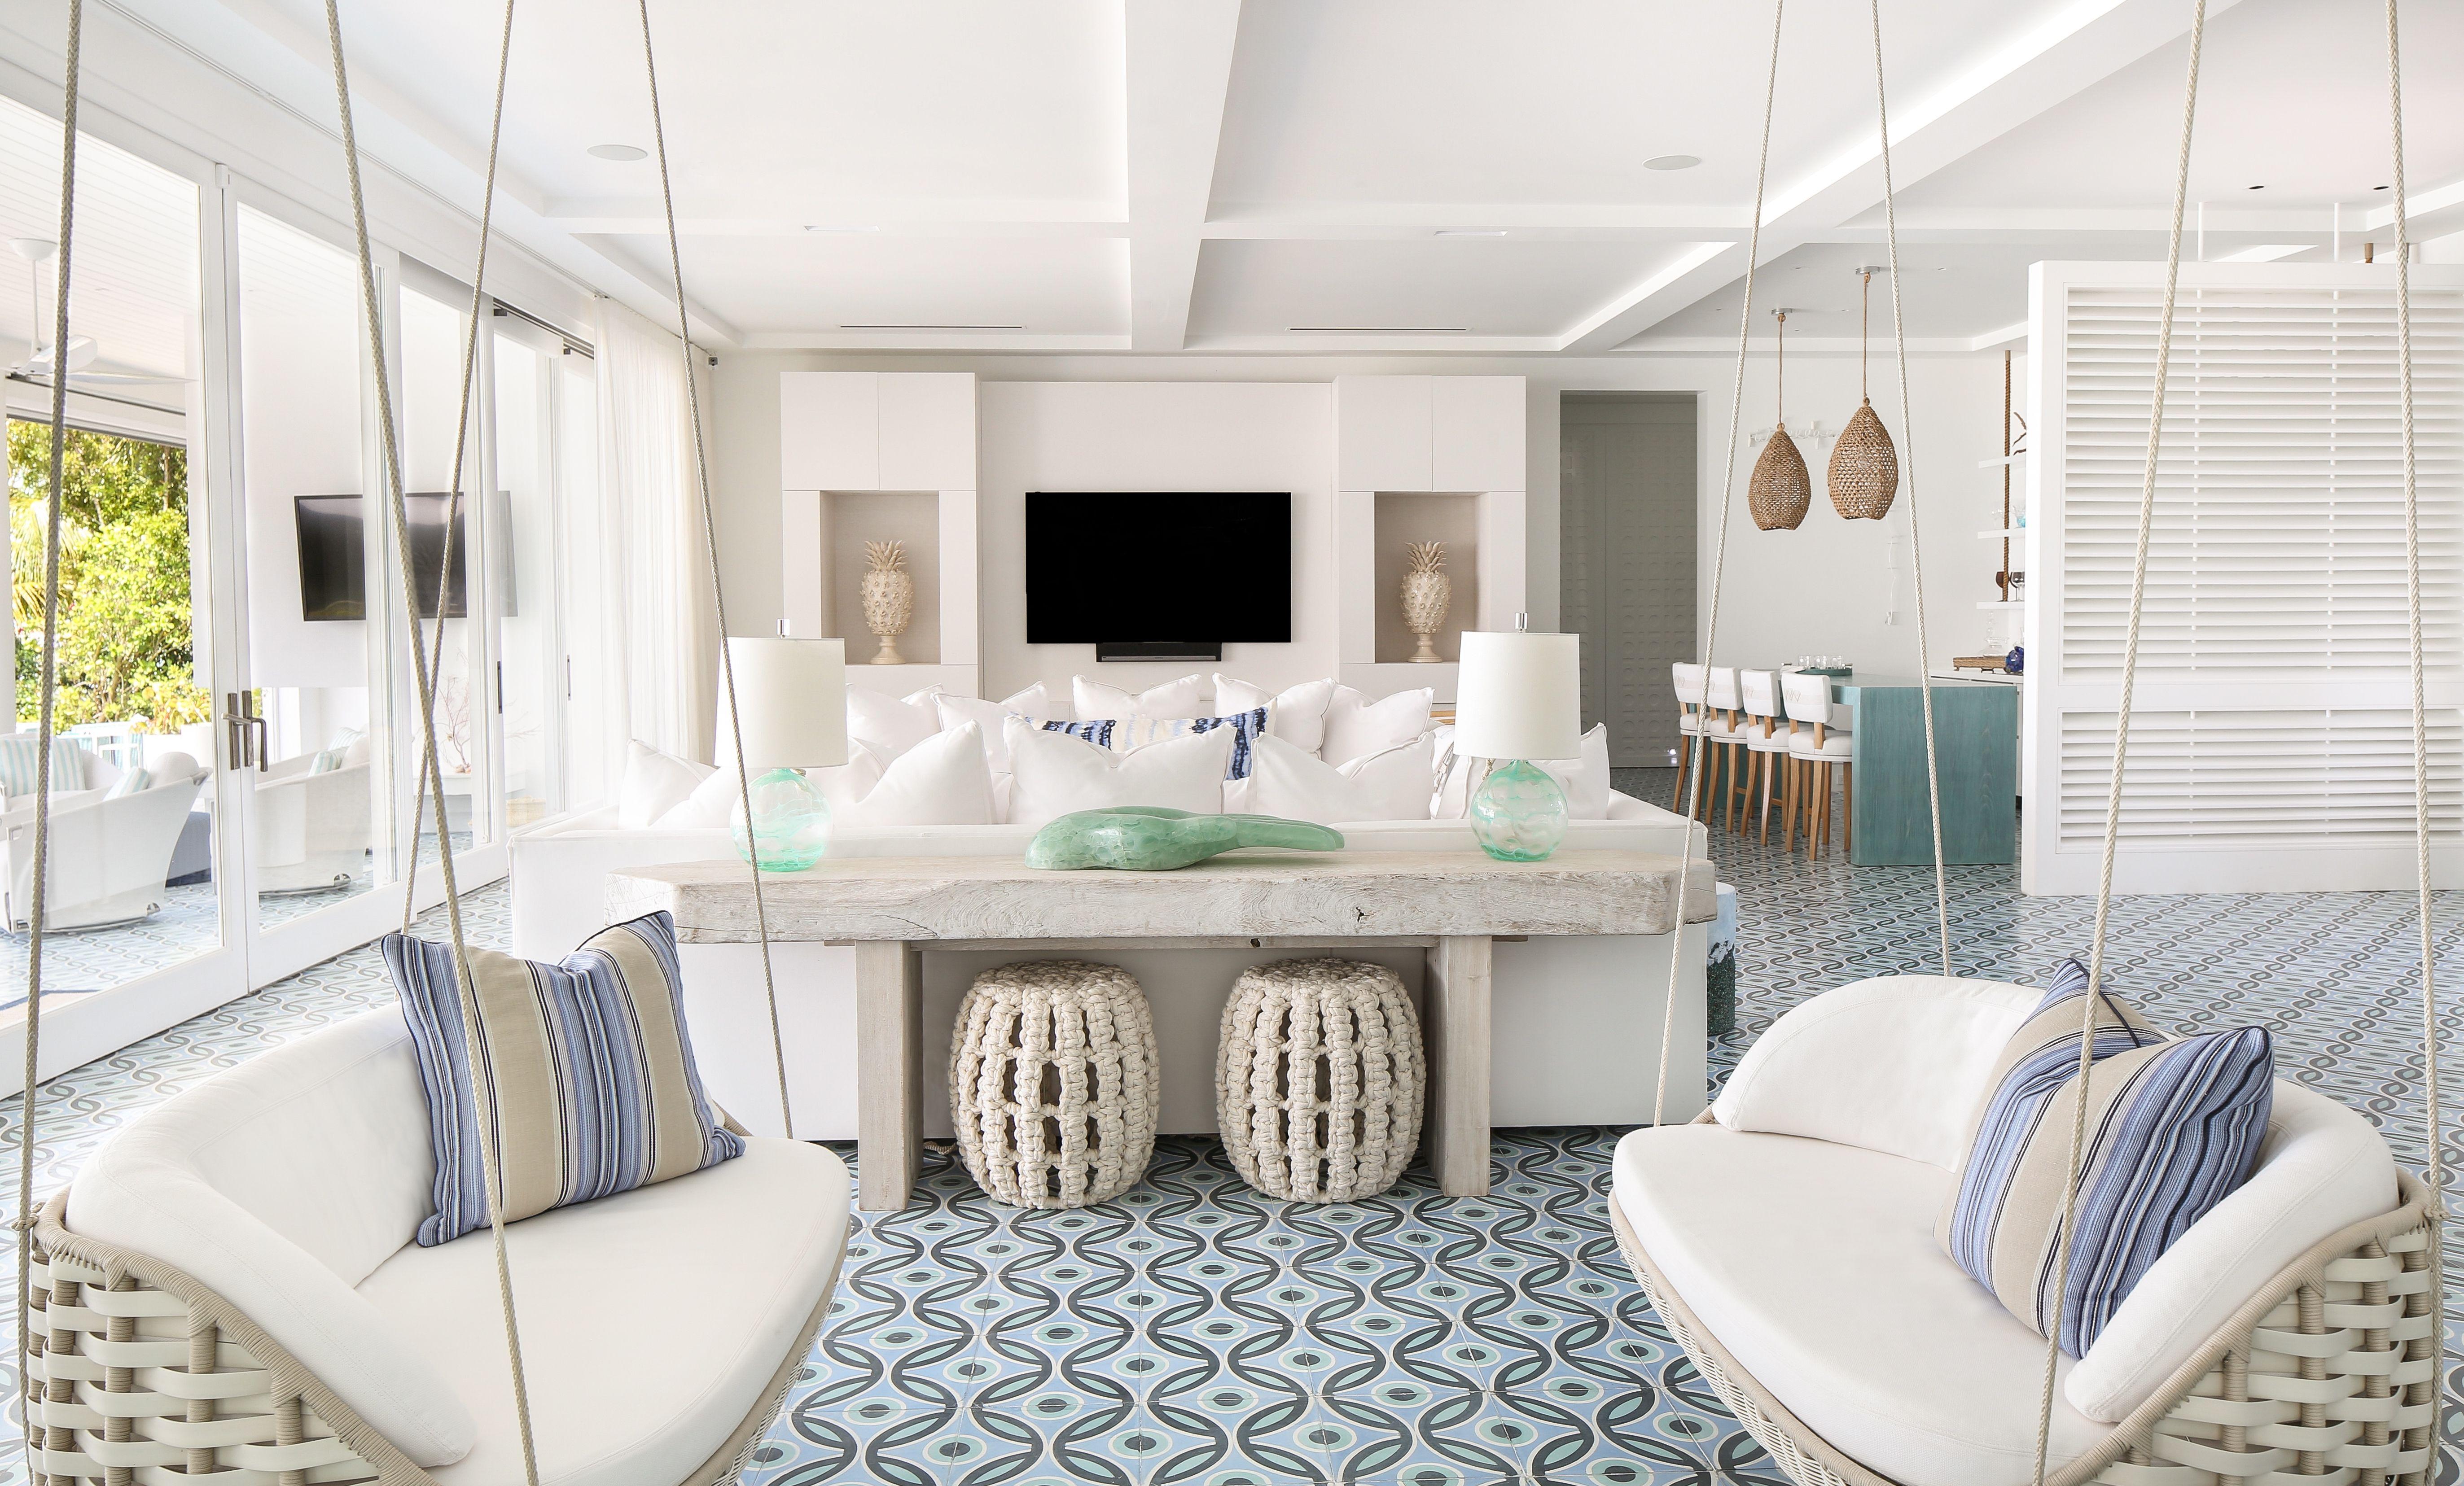 Living Room Livingroom Hangingchairs Bahamas Beachhouse